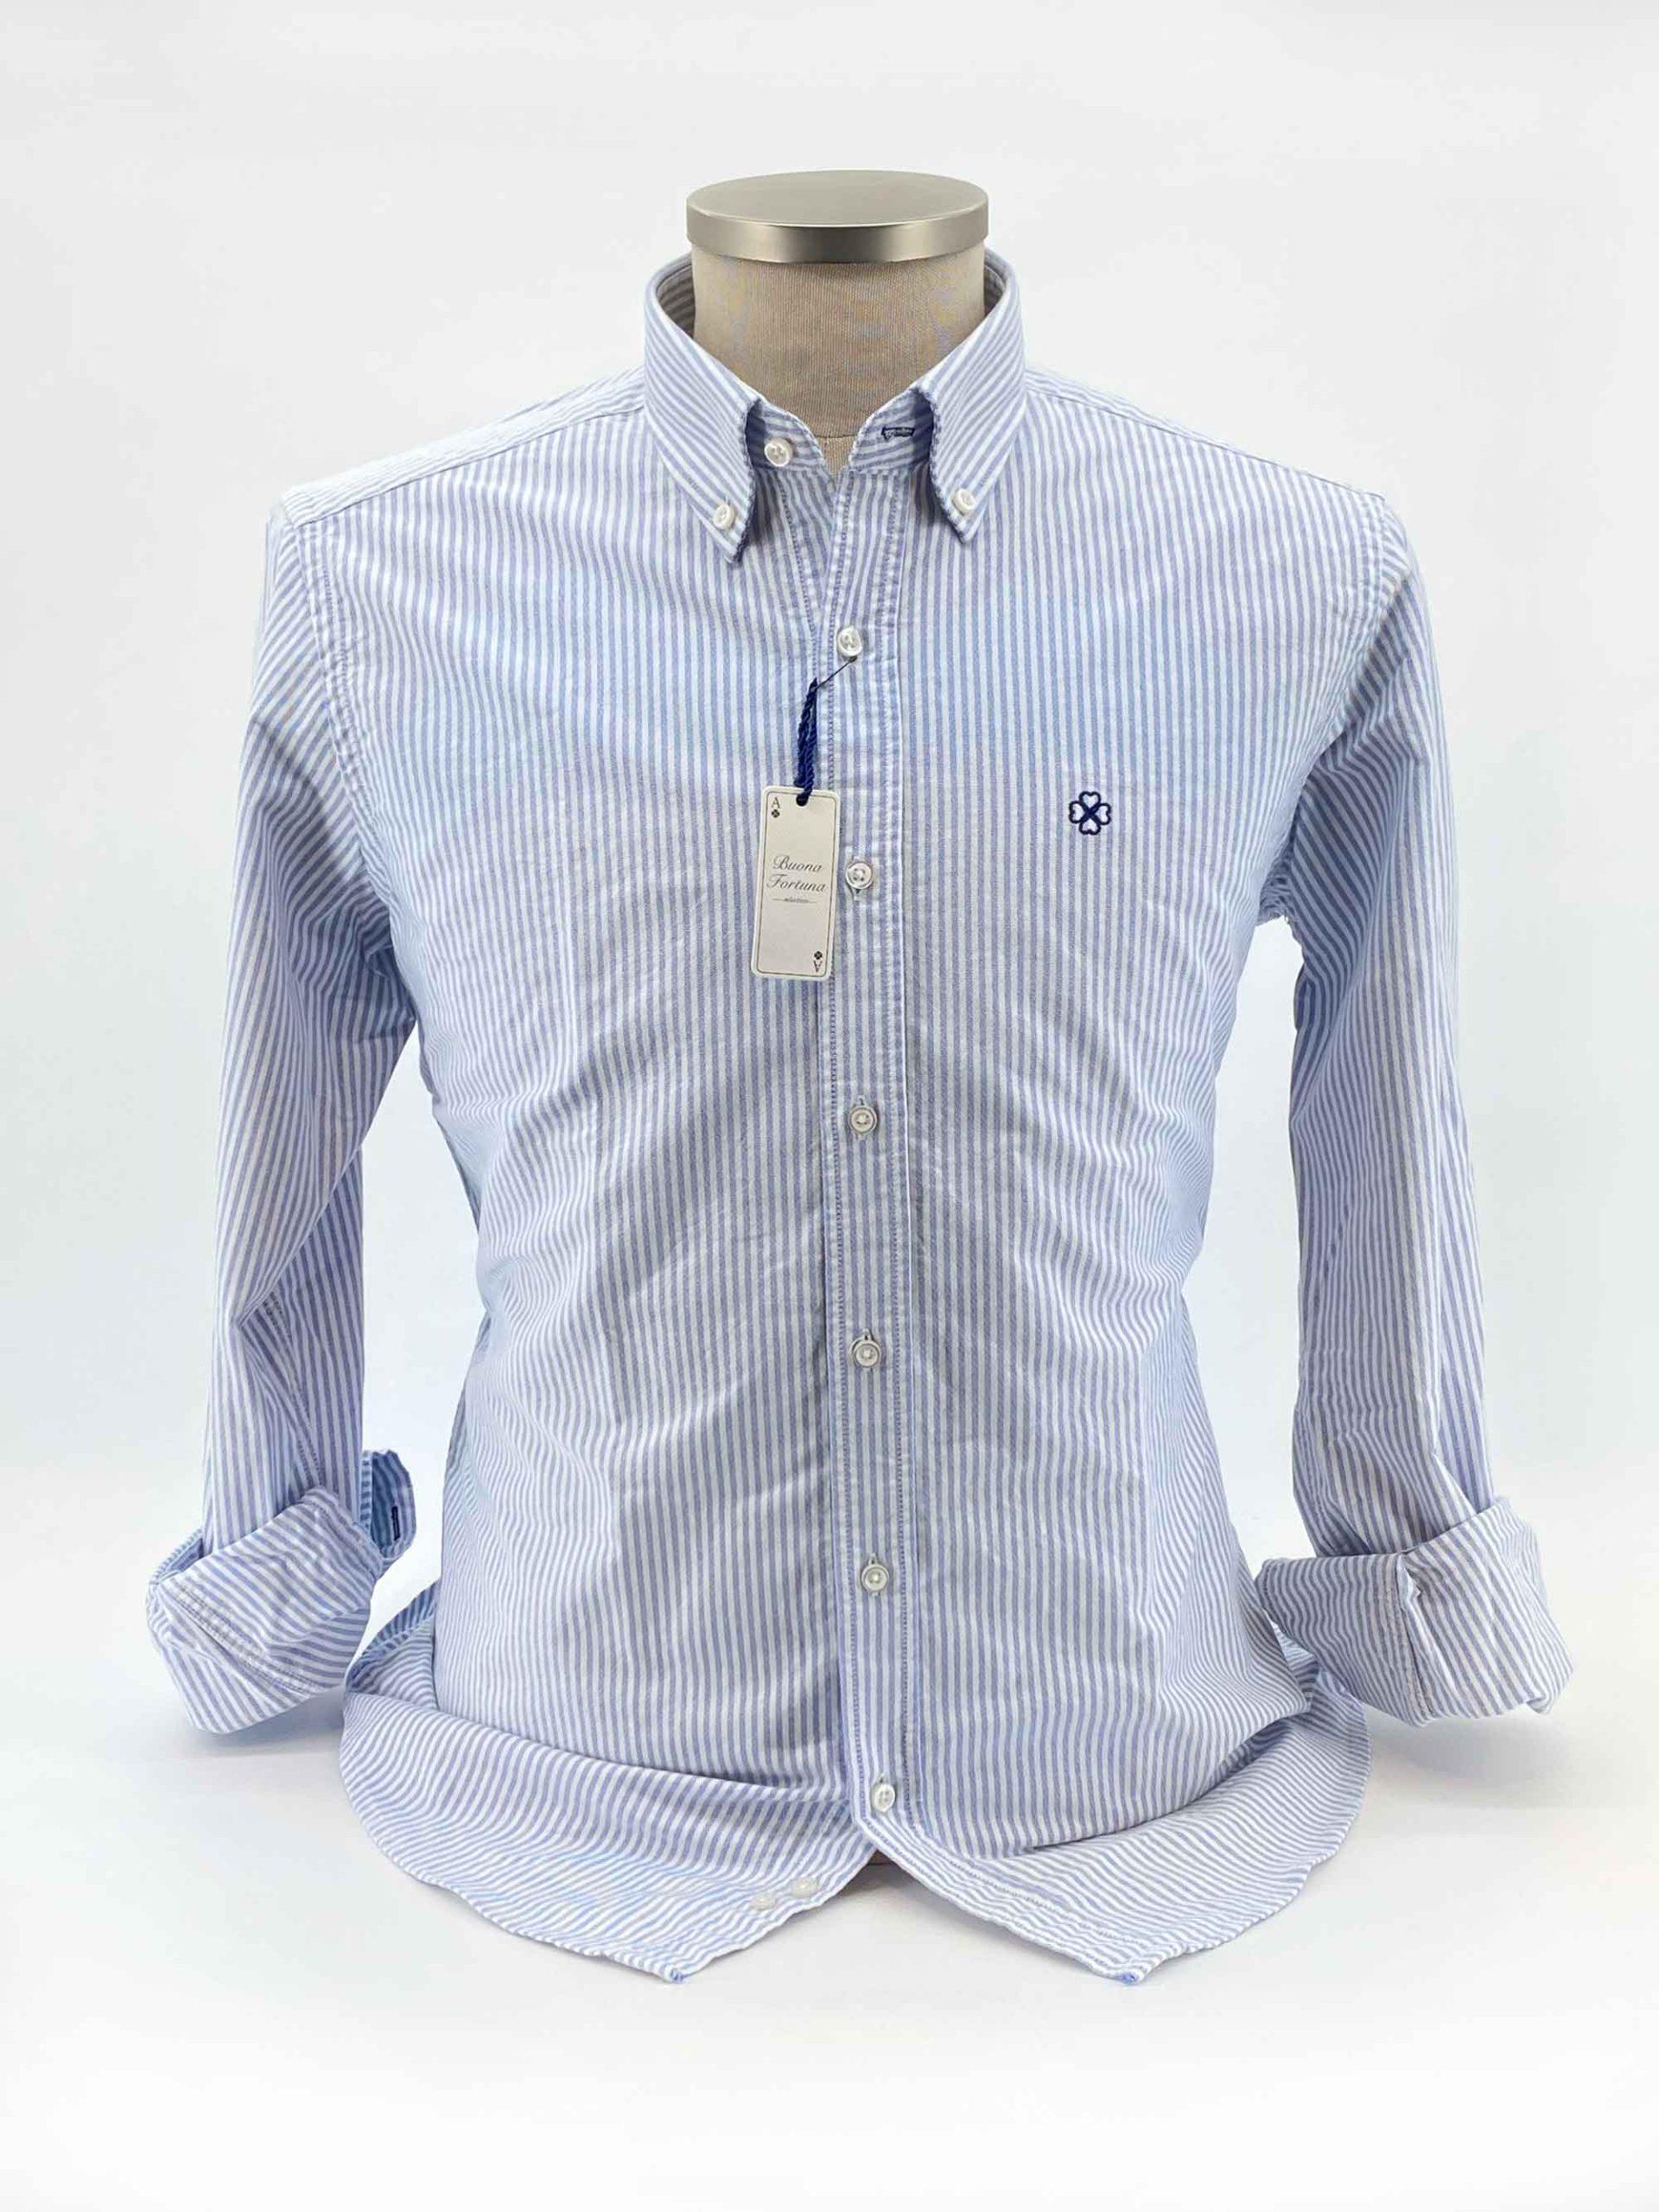 camisas buona fortuna comprar online camisas italianas exlusivas oxford-gruesa raya fina shop busto